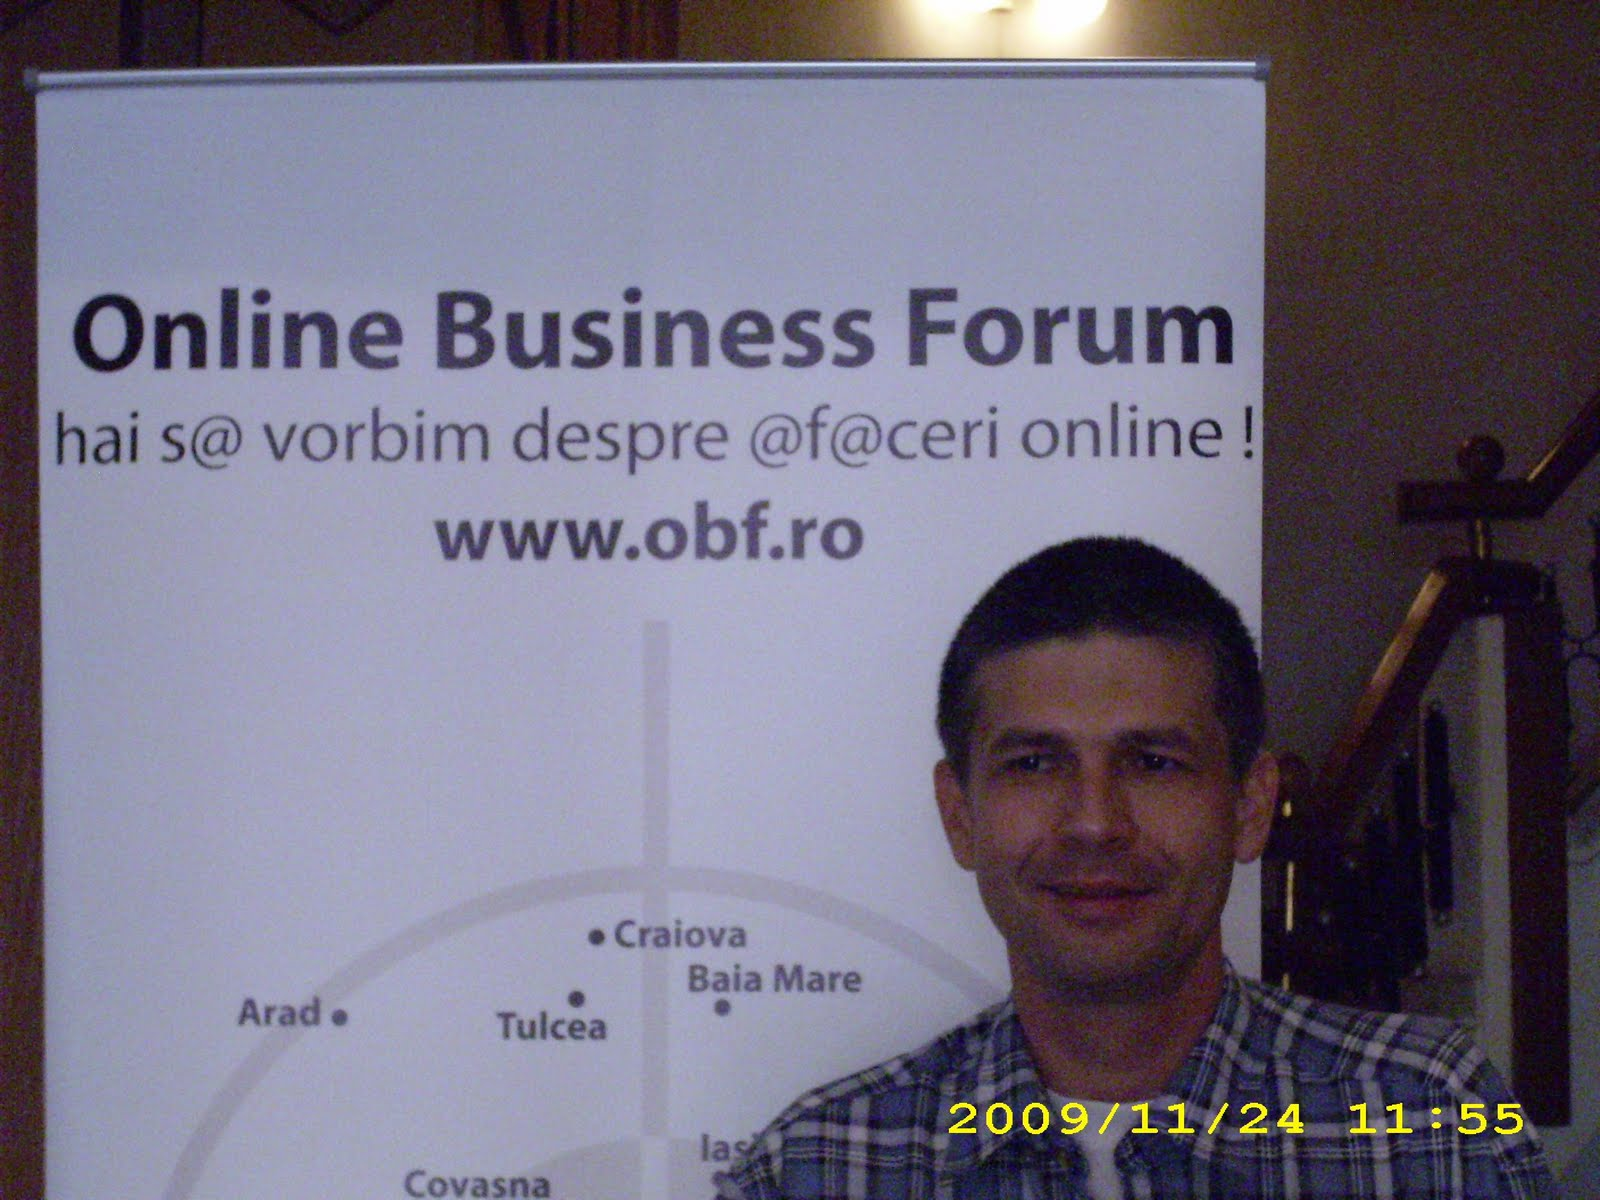 Sorin Frumuseanu Online Business Forum Tirgu Mures